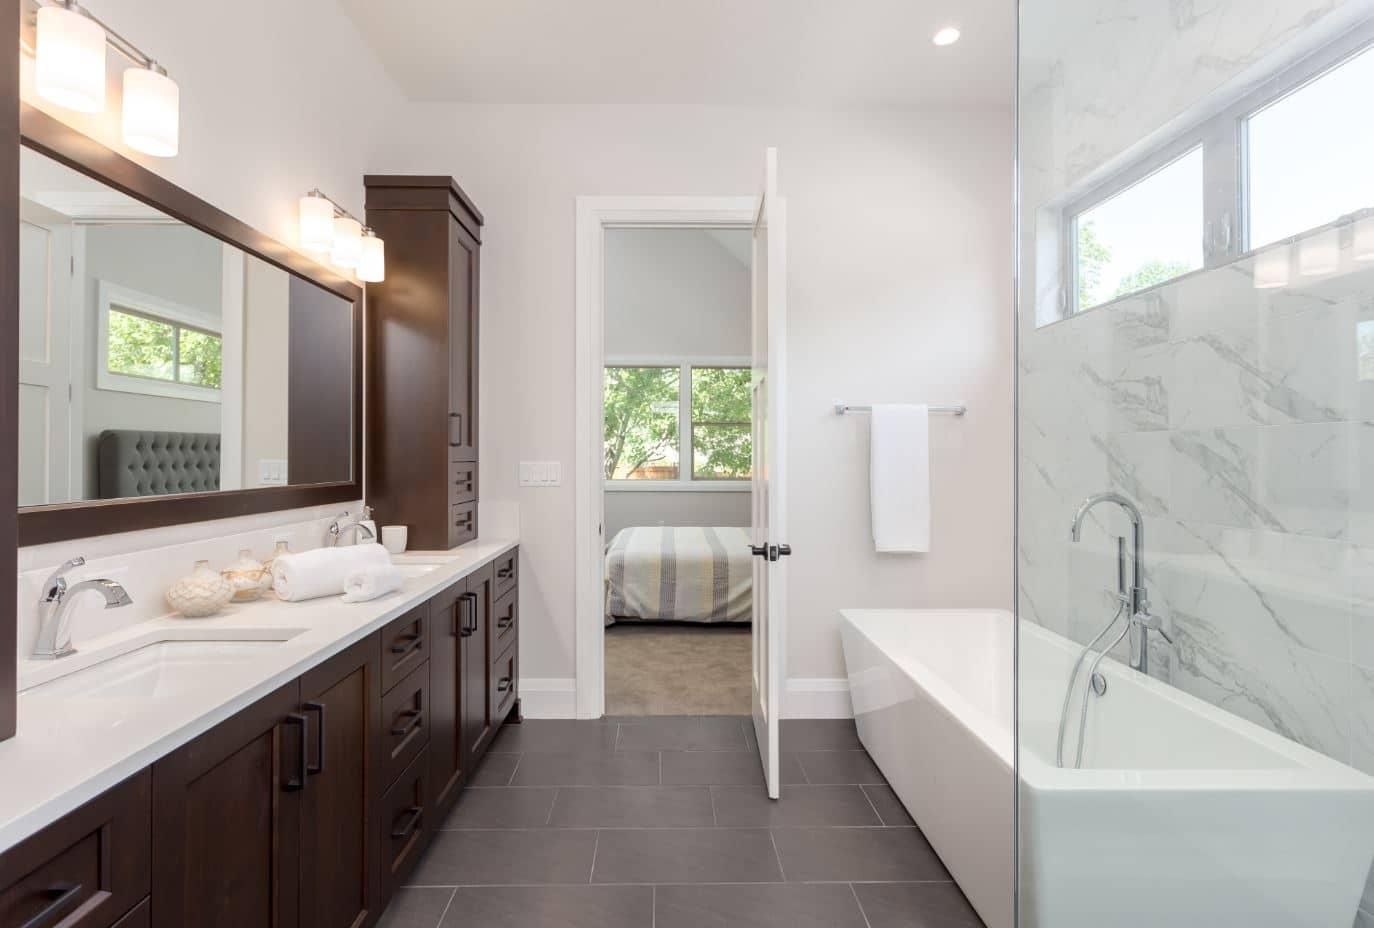 The interior of a master suite bathroom renovation